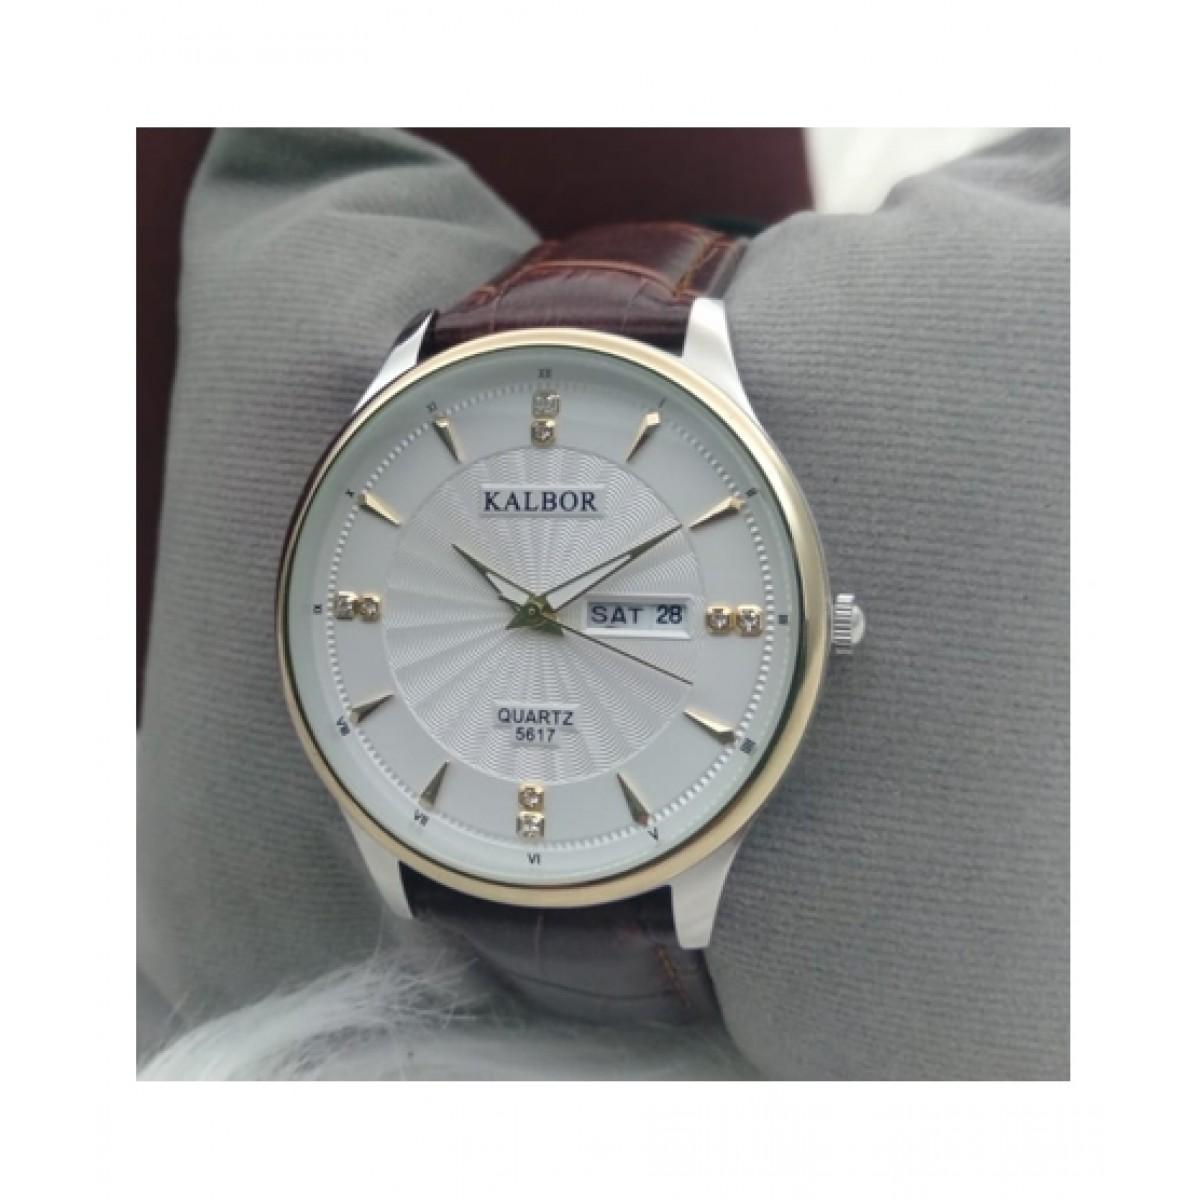 KK Accessories Kalbor Analog Watch For Men Brown (BGI1-0293)